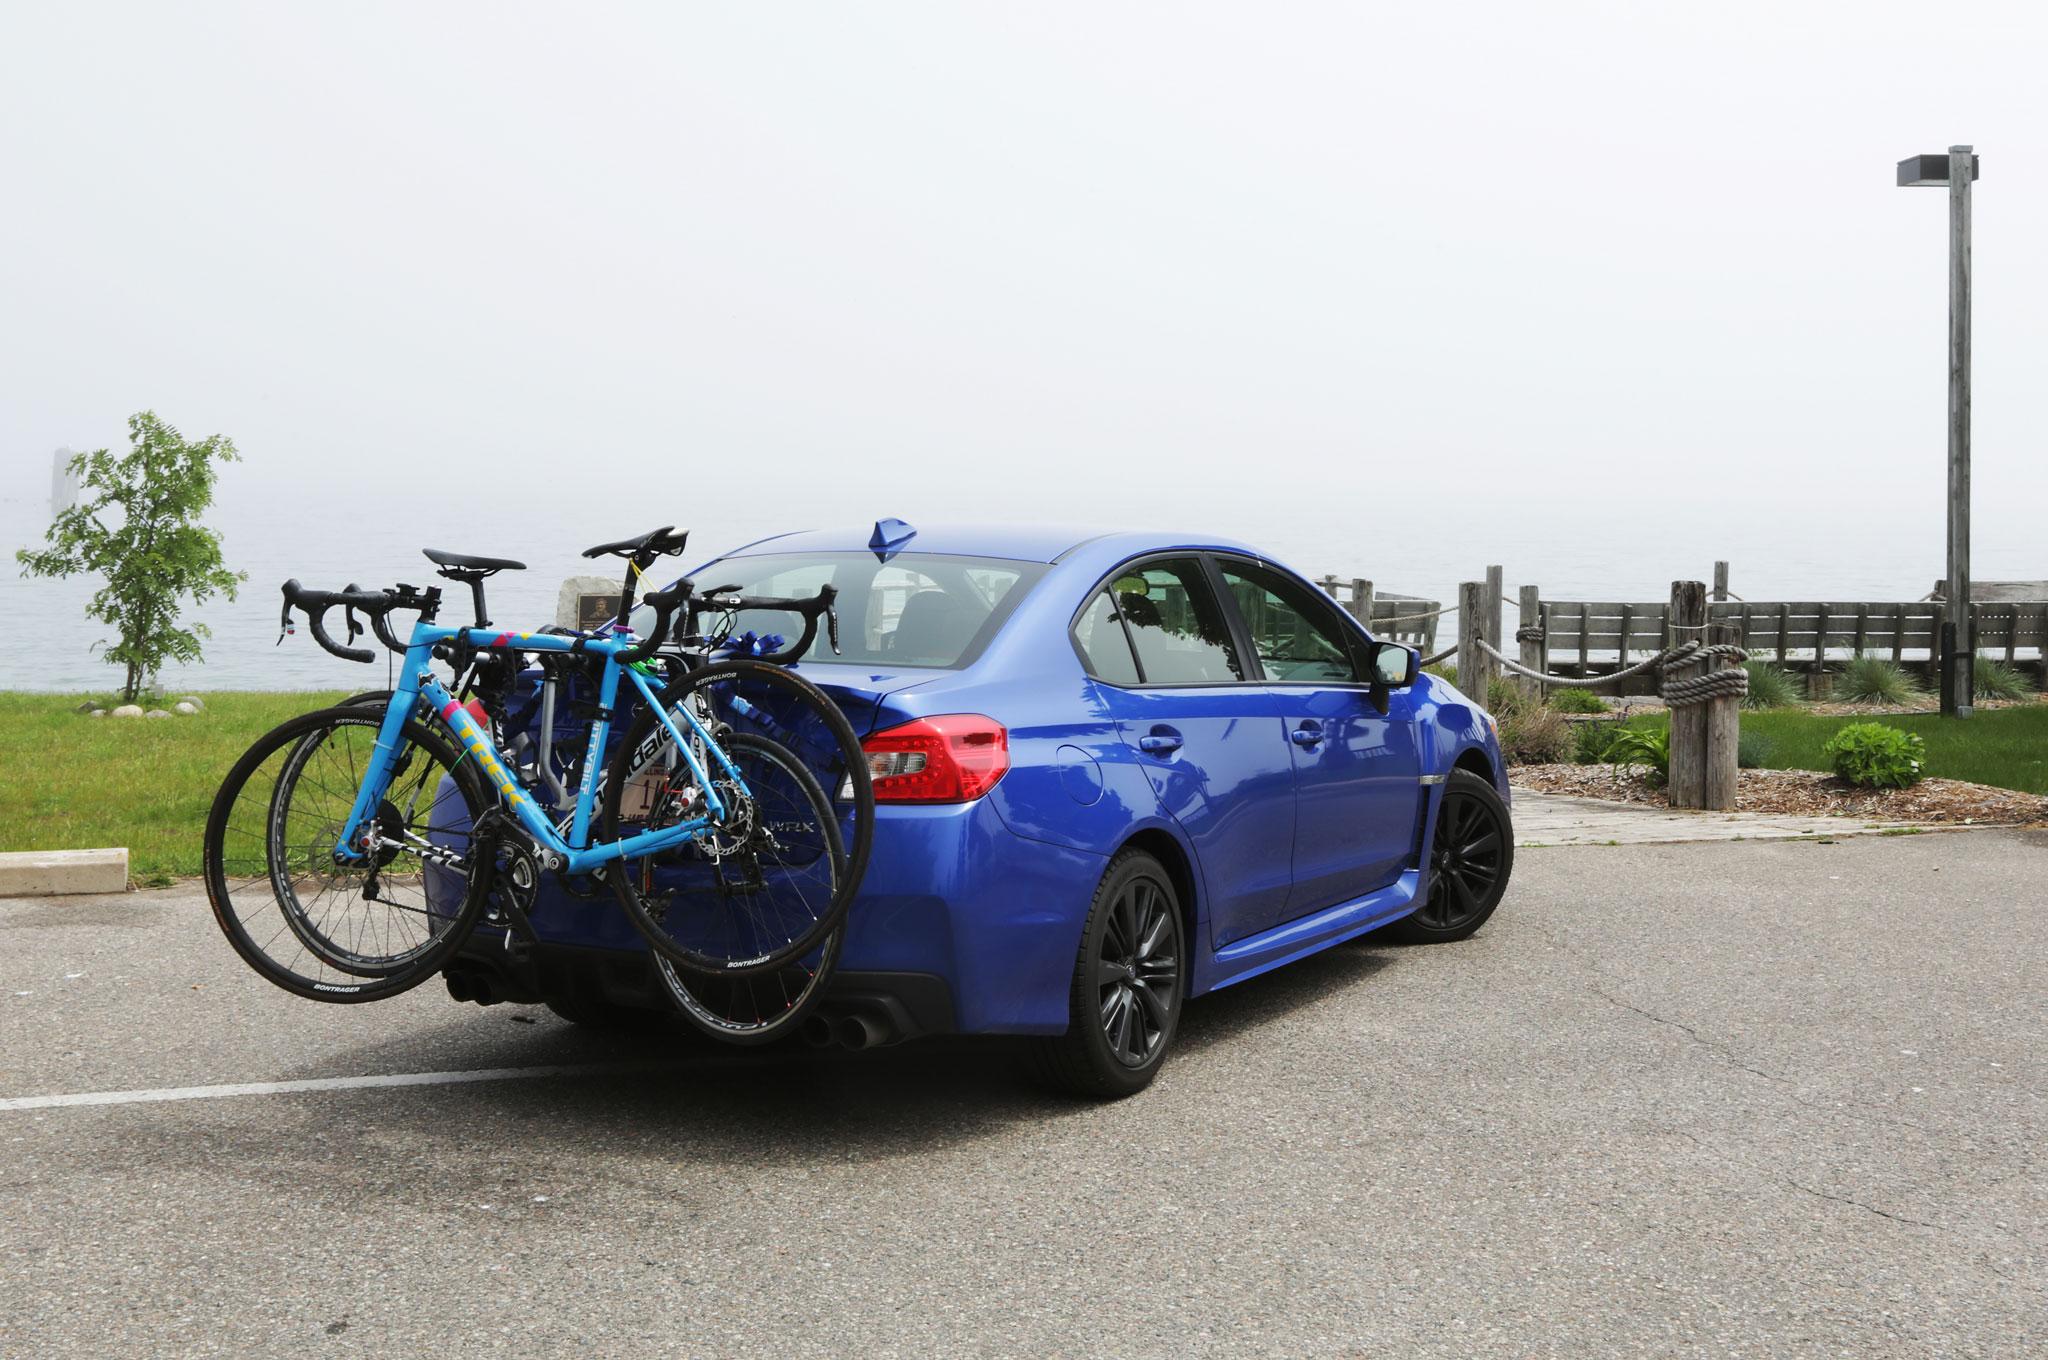 Subaru Wrx To The Bridge And Back